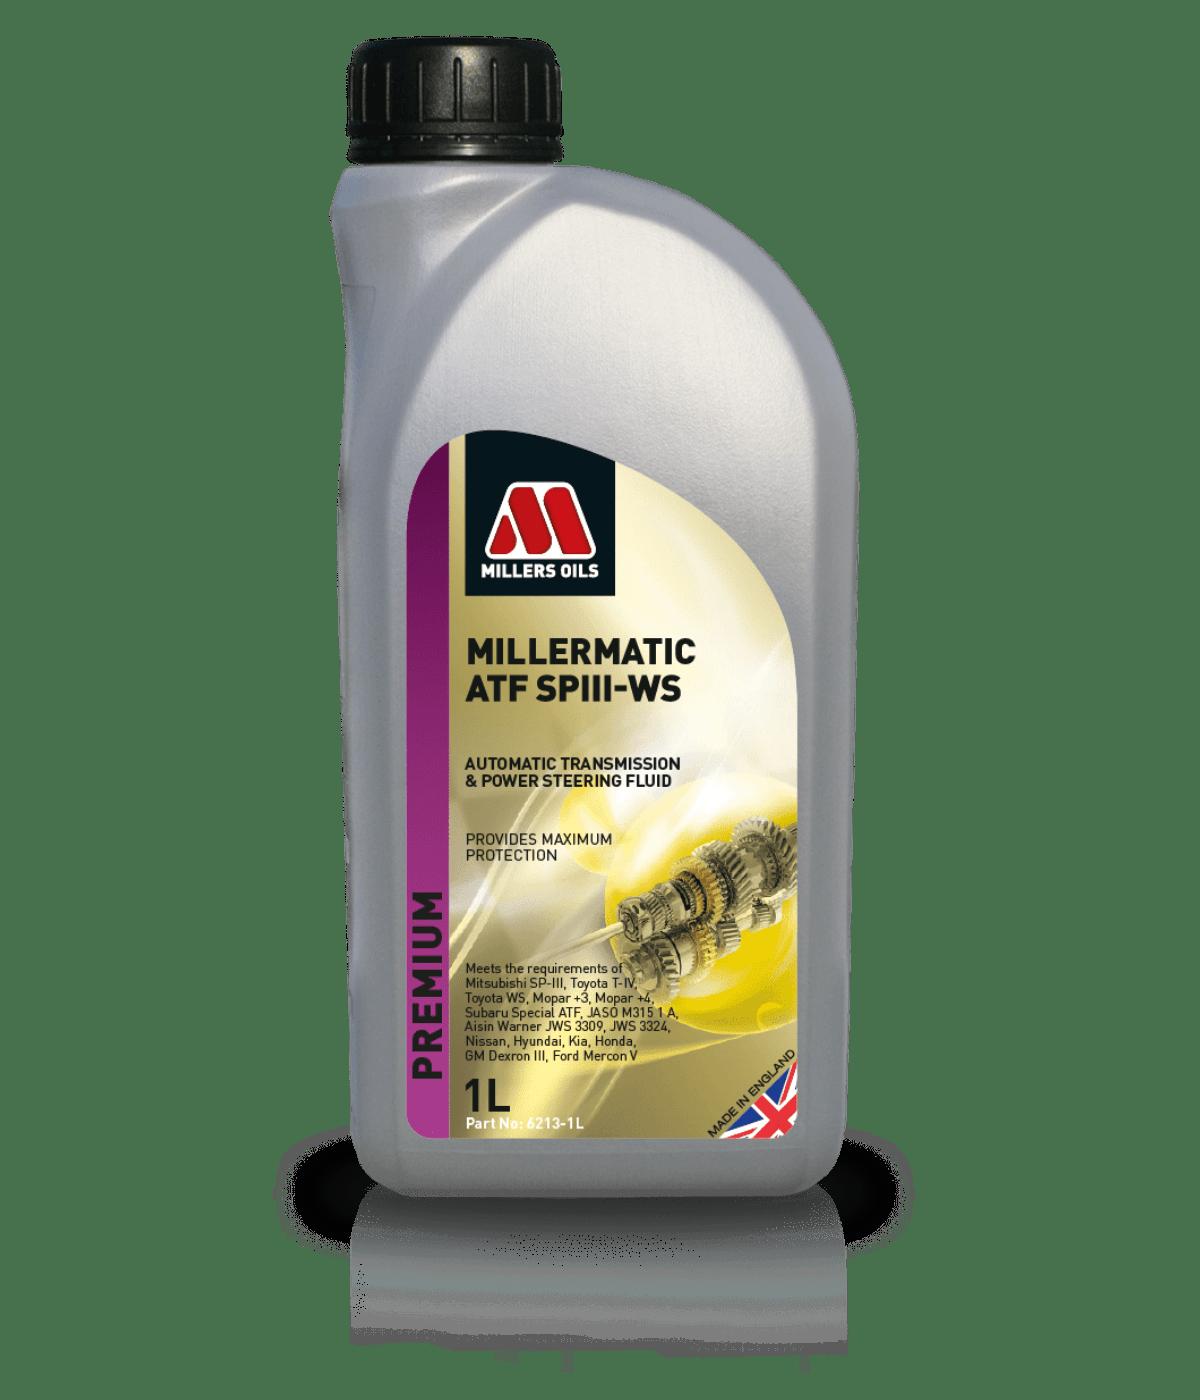 P14220 - Millermatic ATF SP III-WS 6213-1L-01